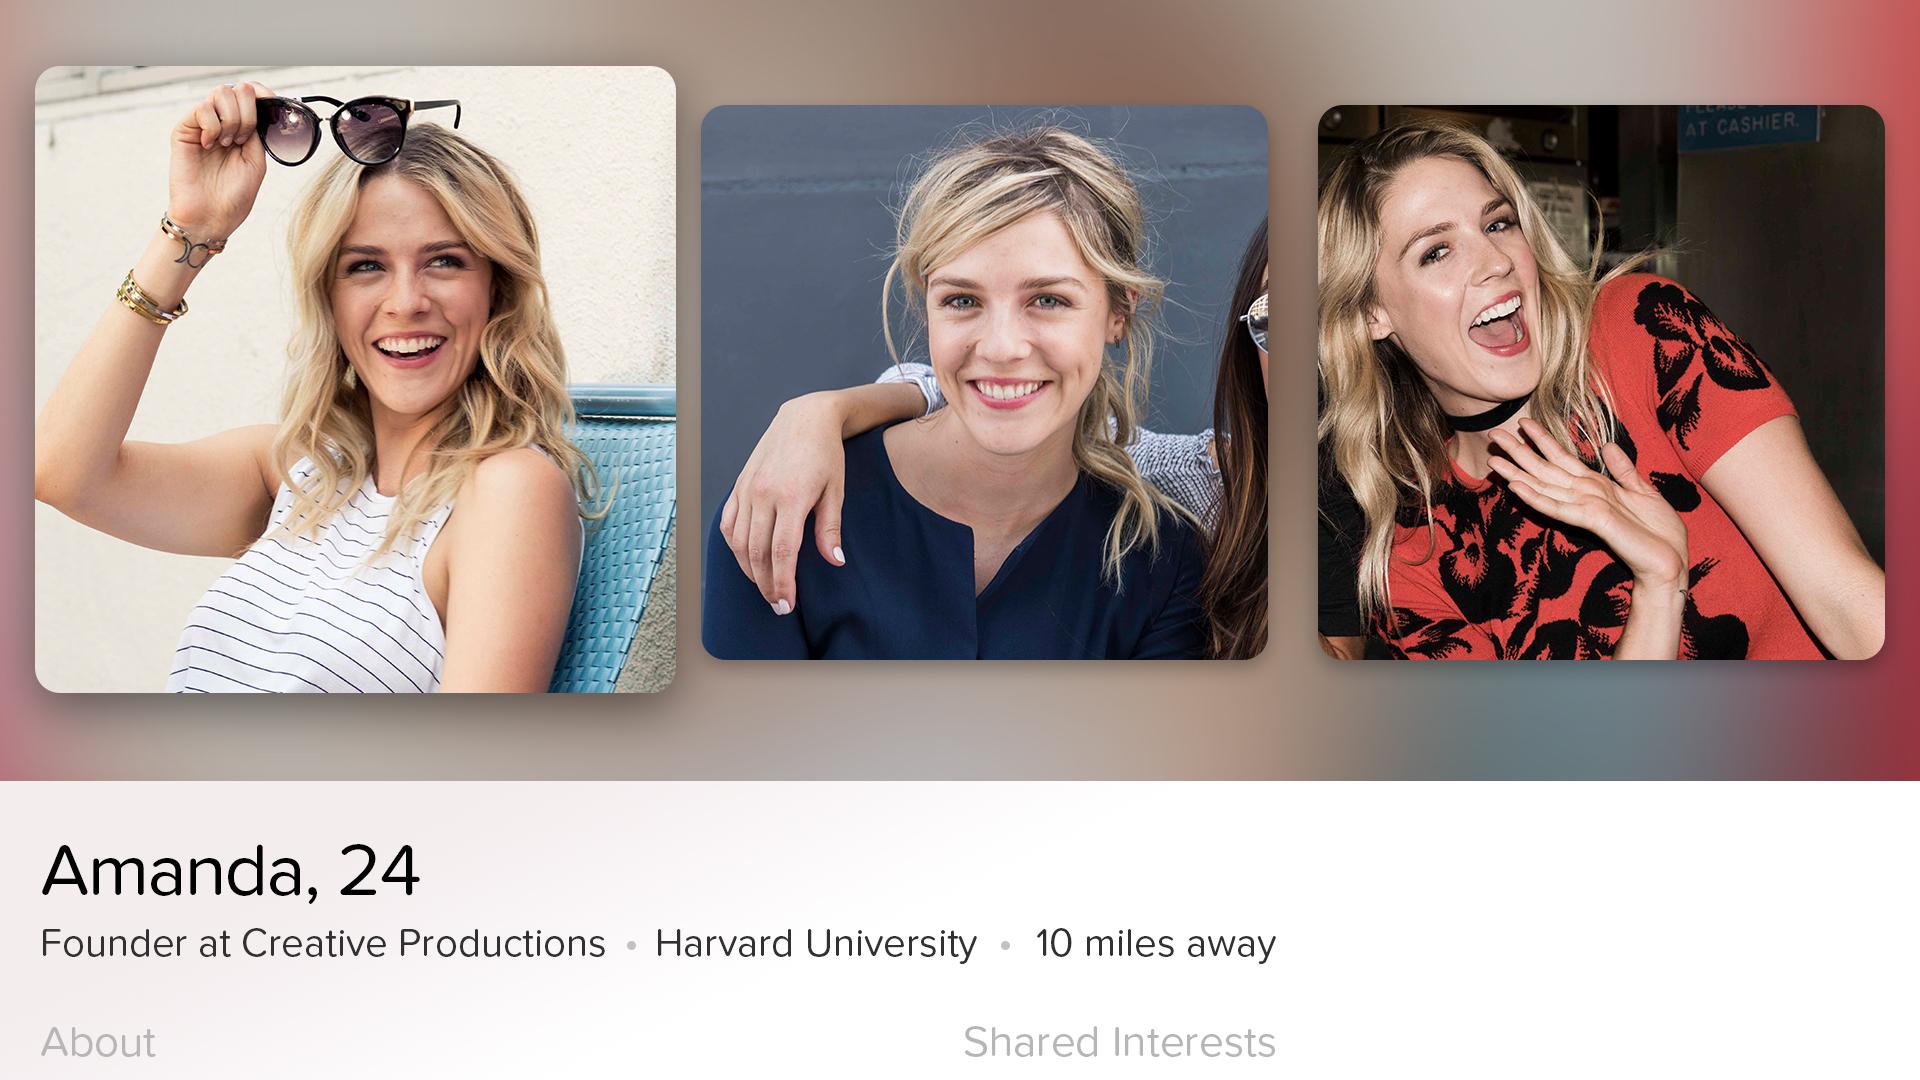 Tinder - Dating New People screenshot 8